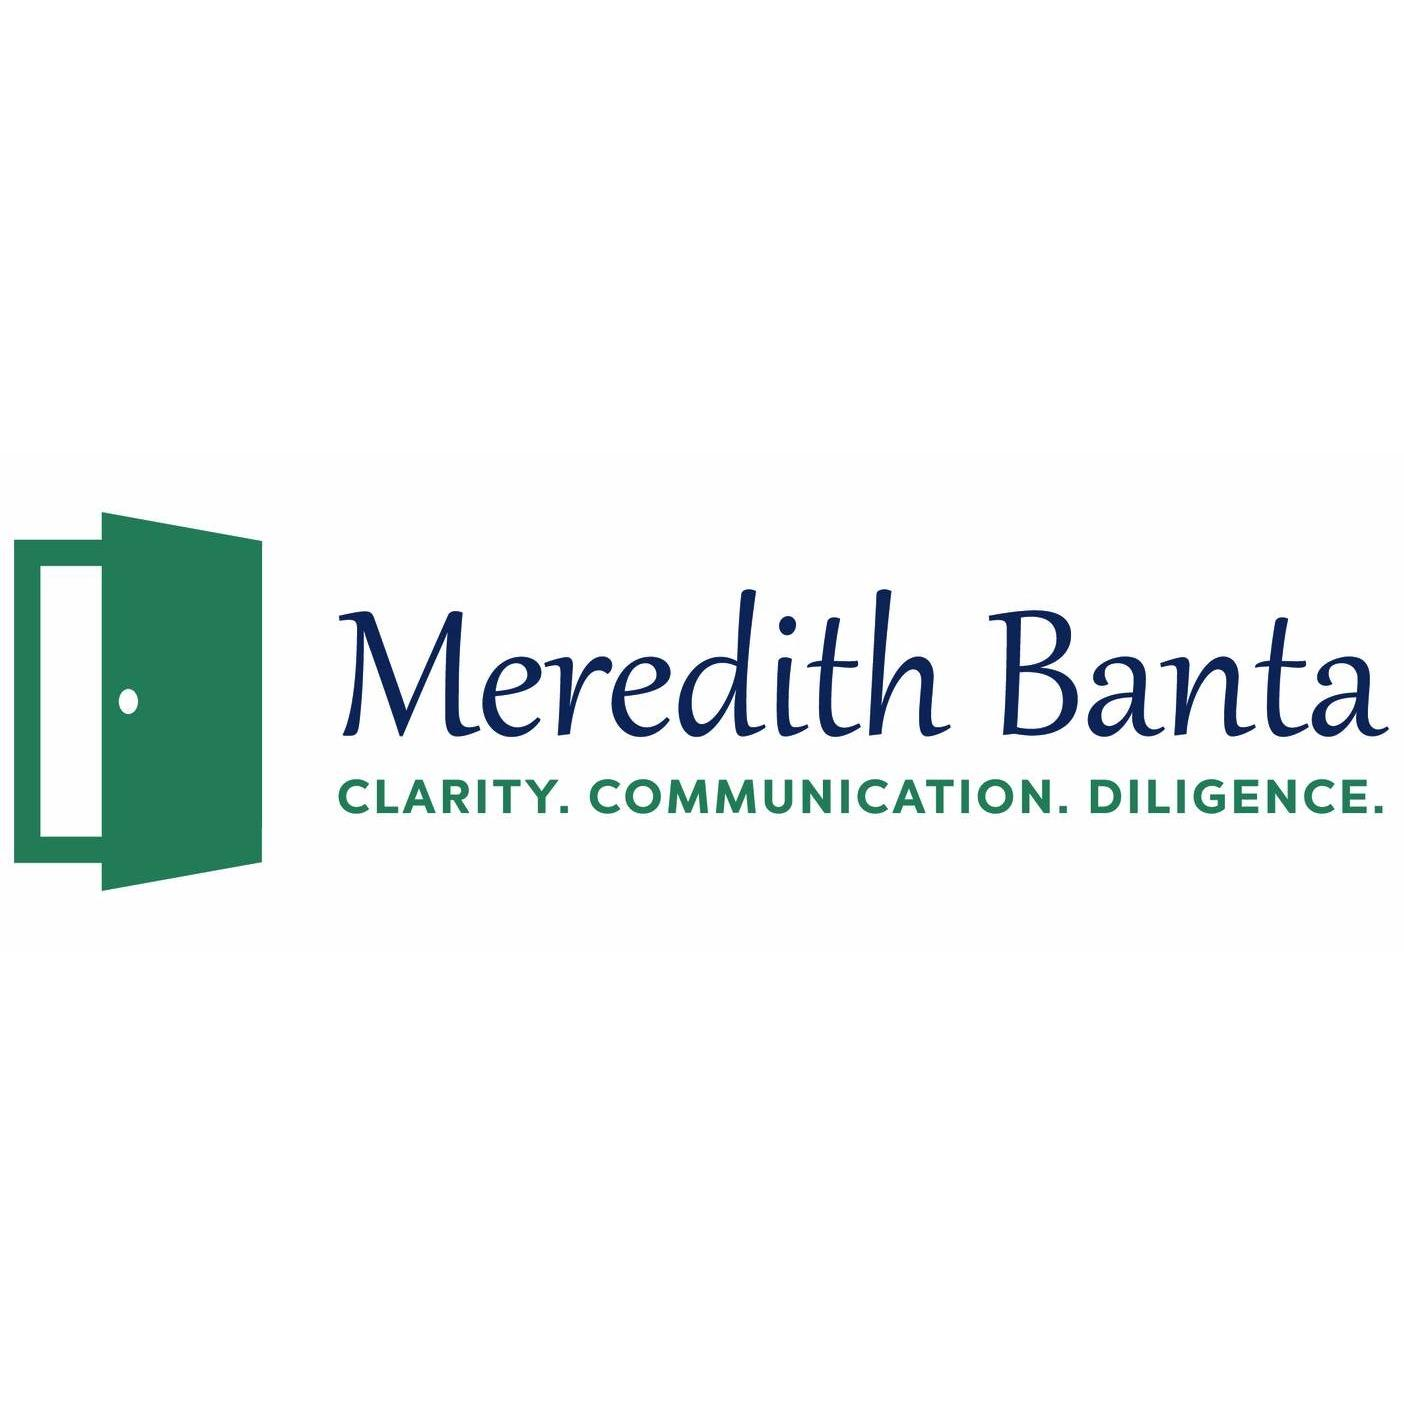 Meredith Banta | @properties image 1